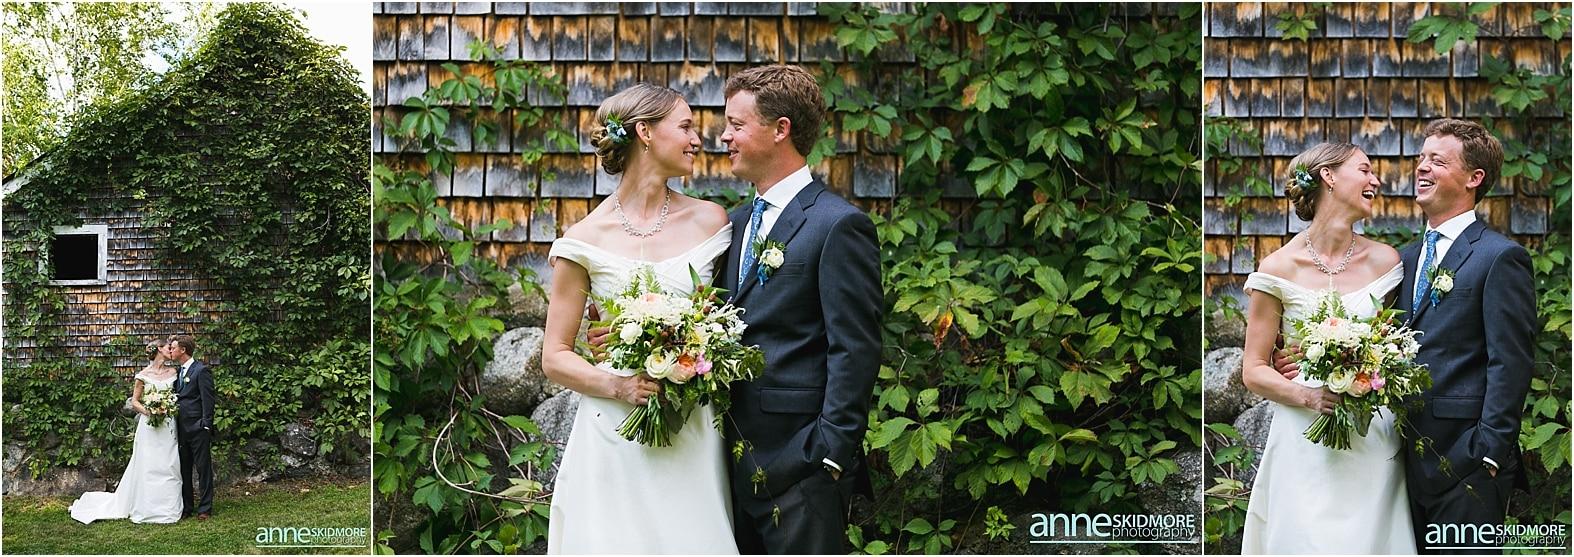 new_hampshire_wedding_photography_0045